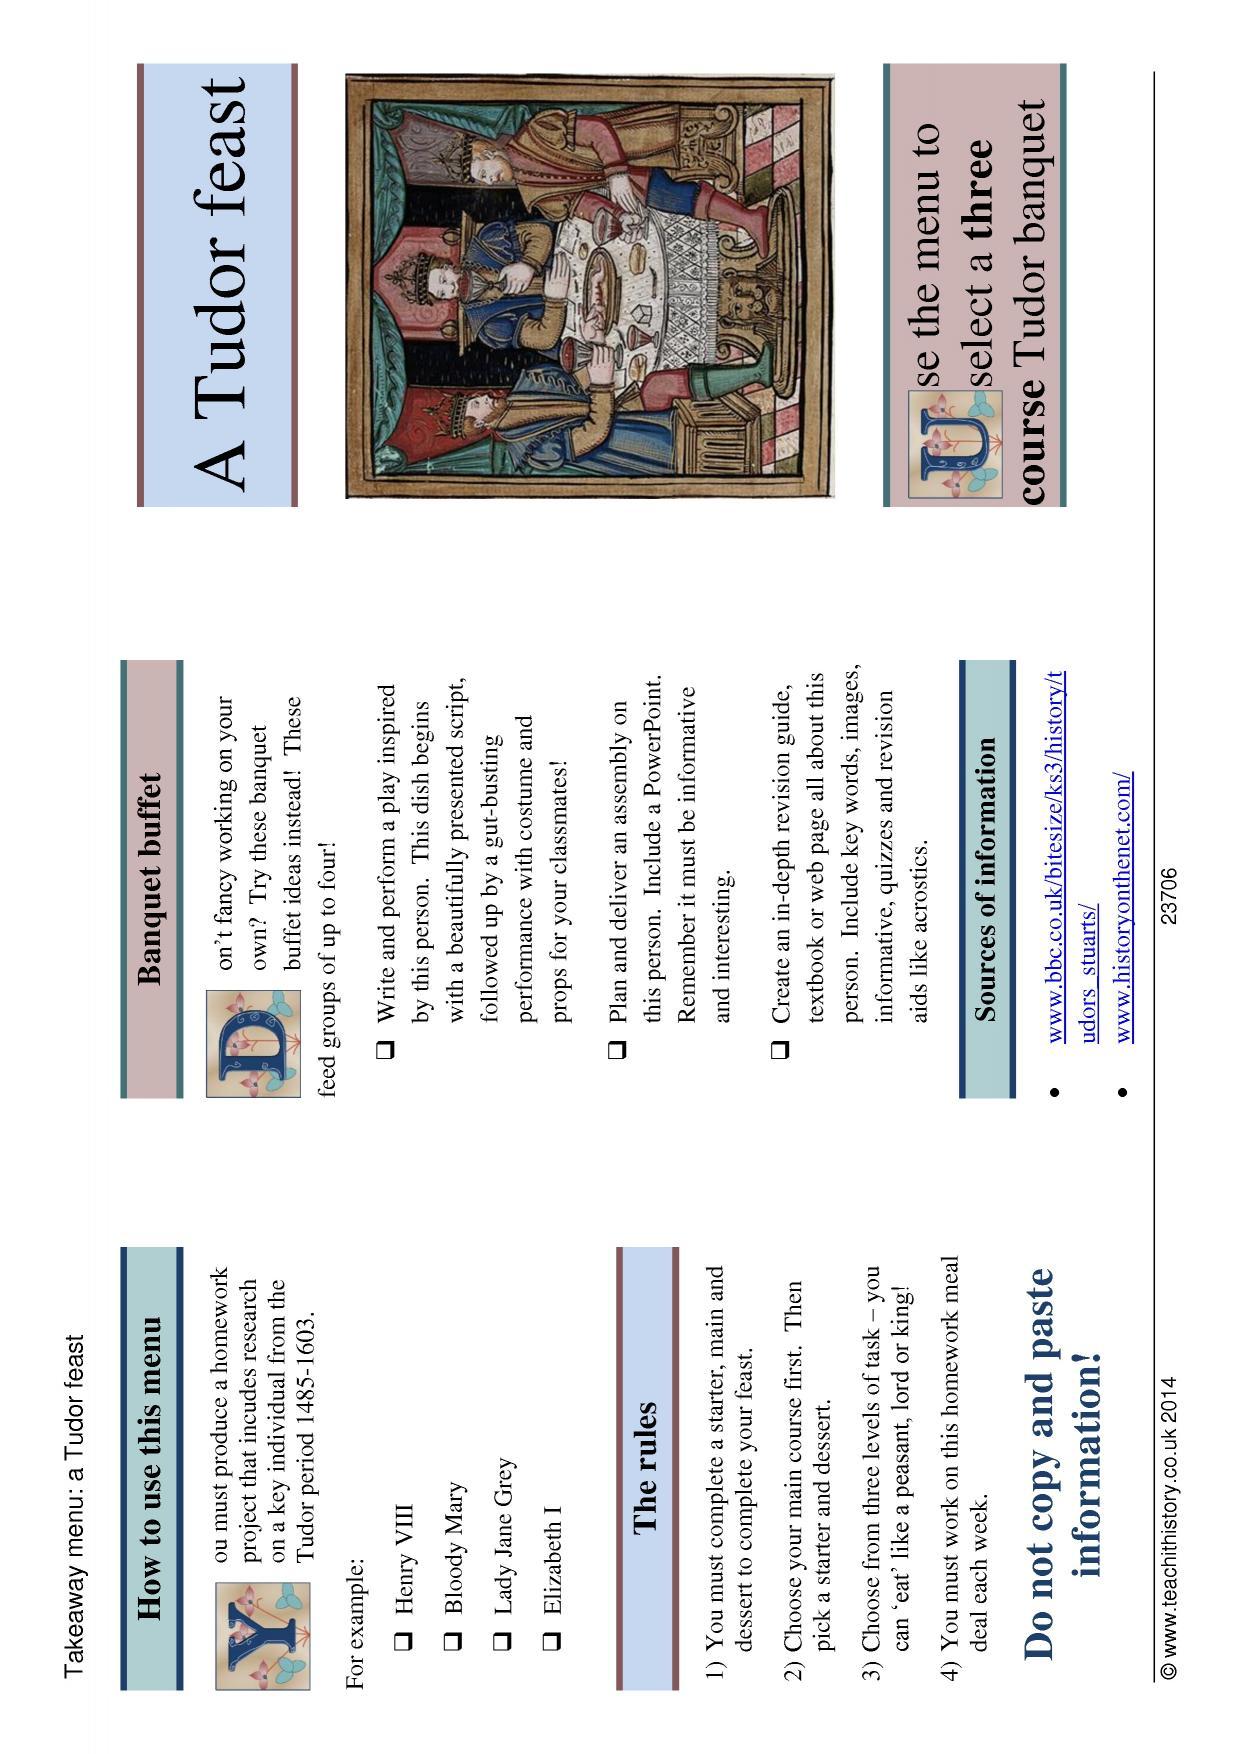 tudor menu template - takeaway menu tudor feast